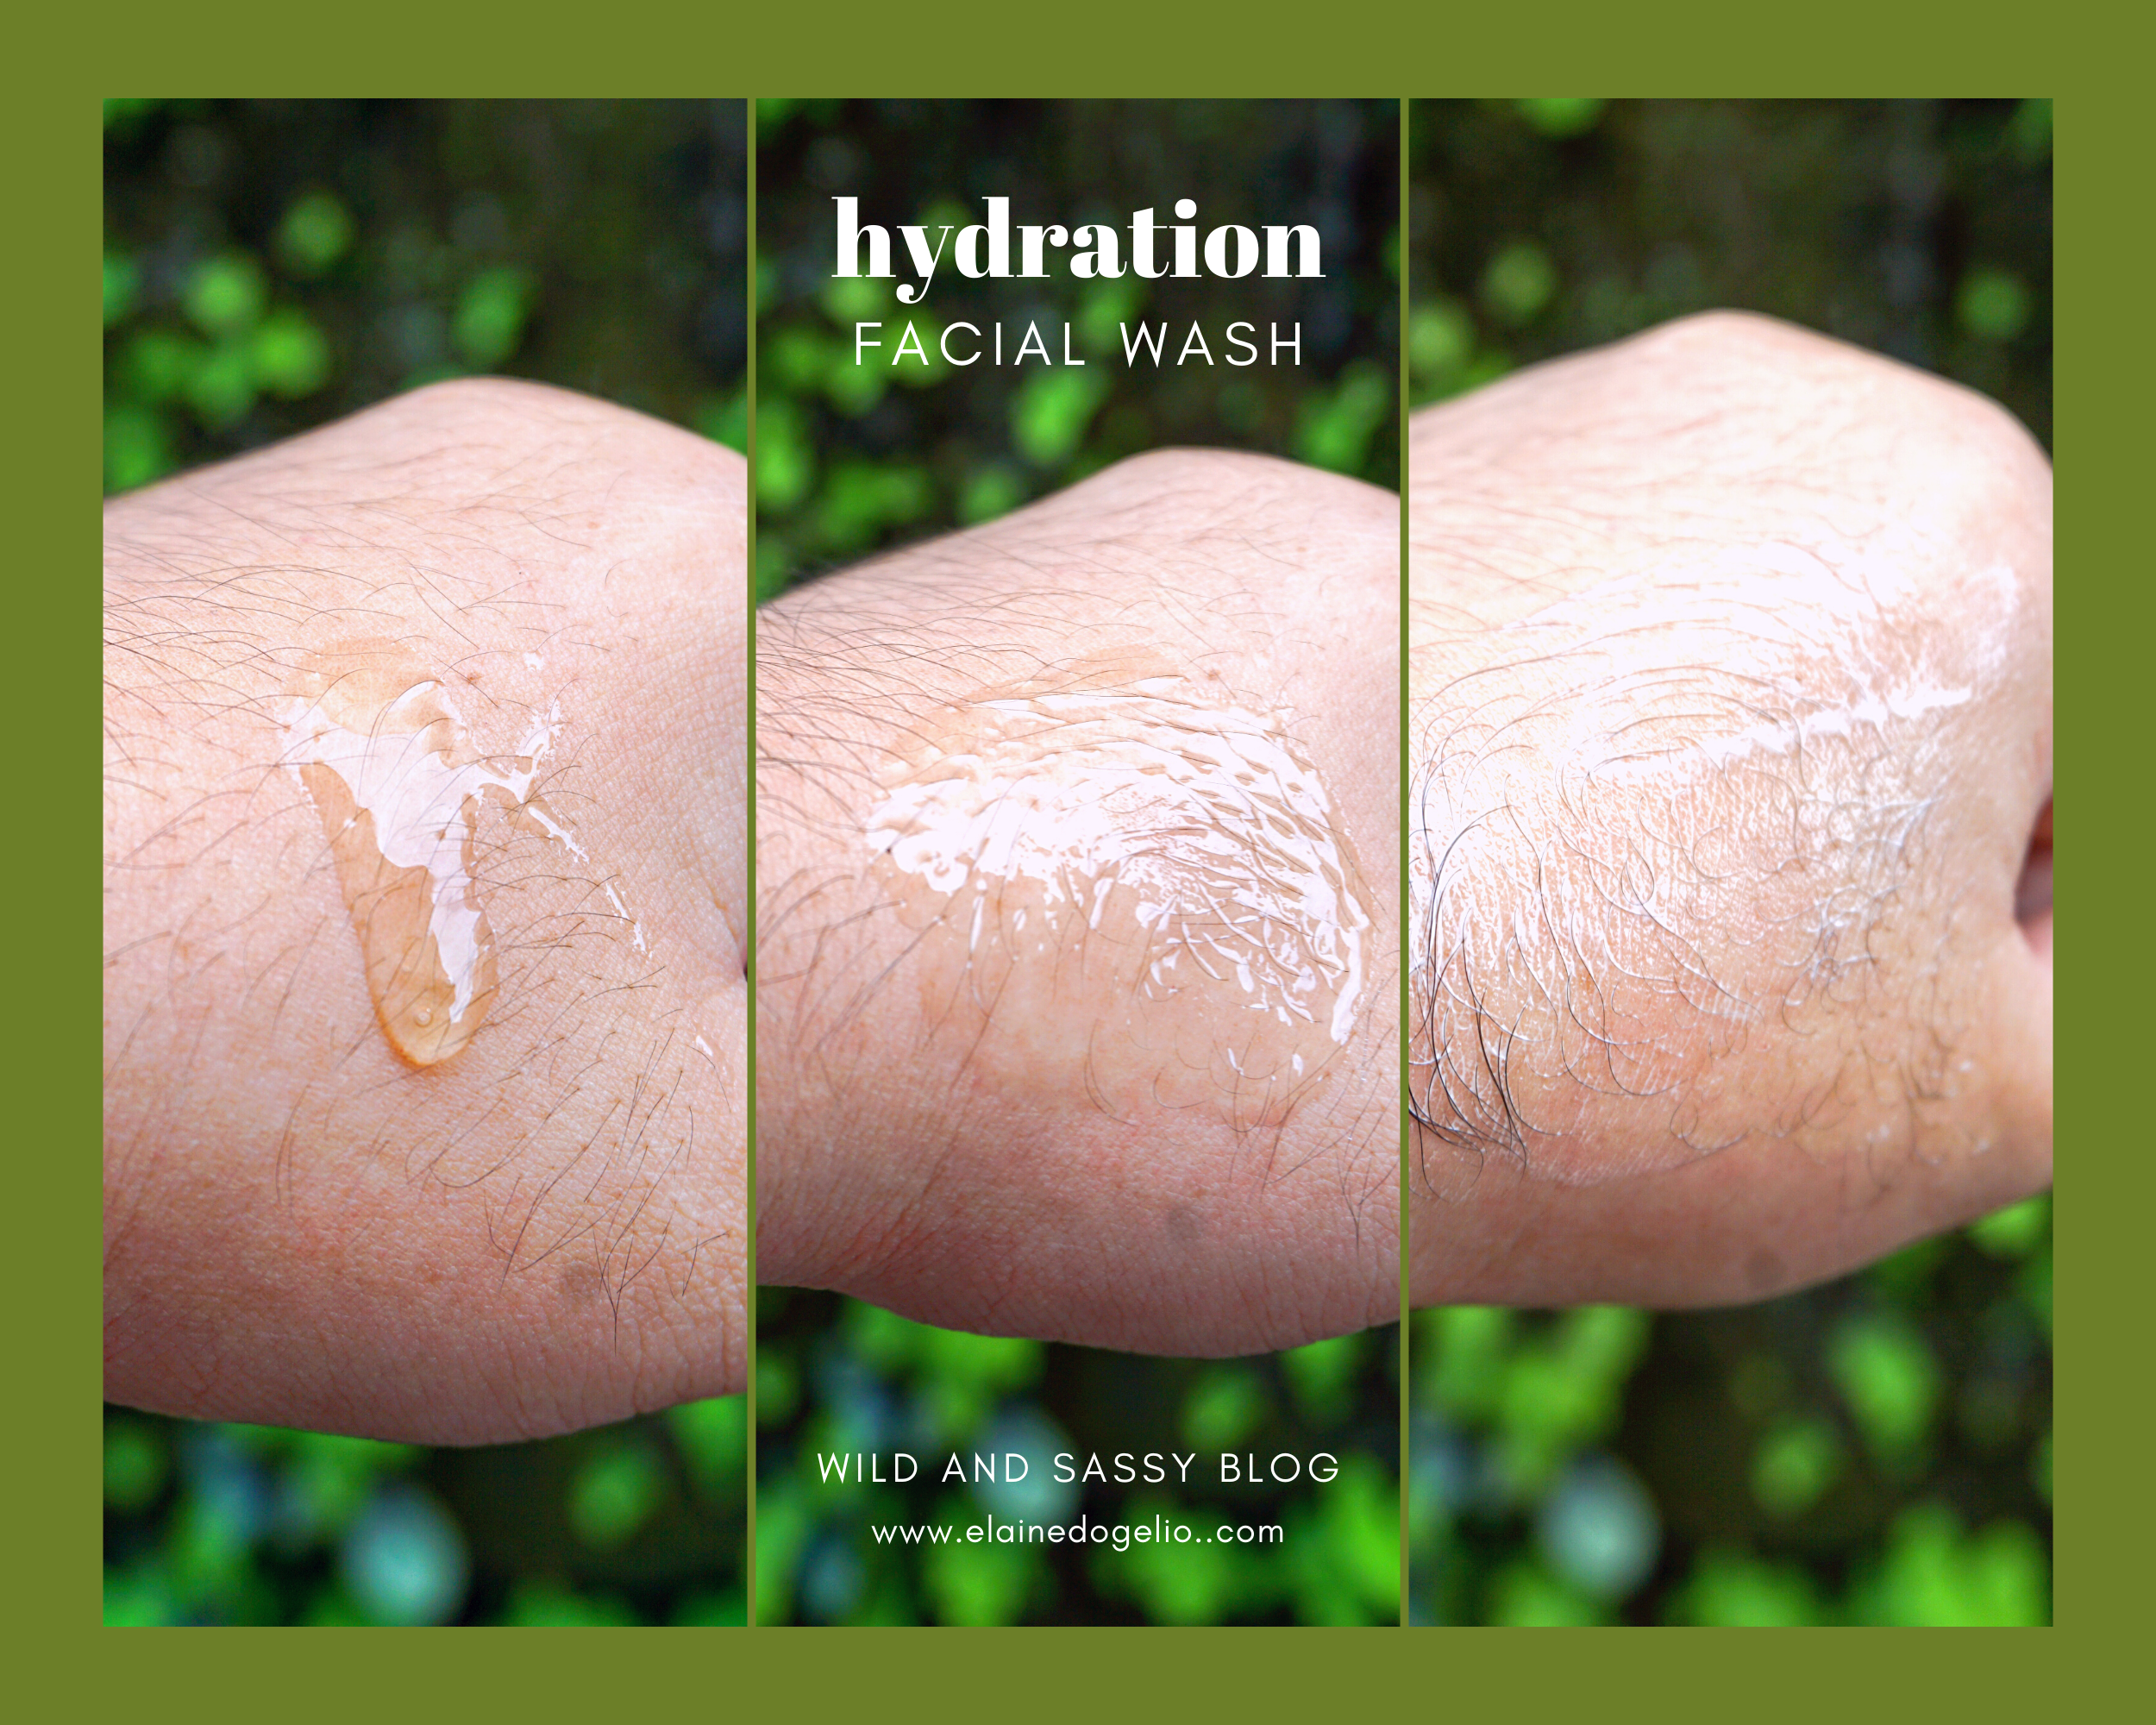 Celeteque Hydration Facial Wash